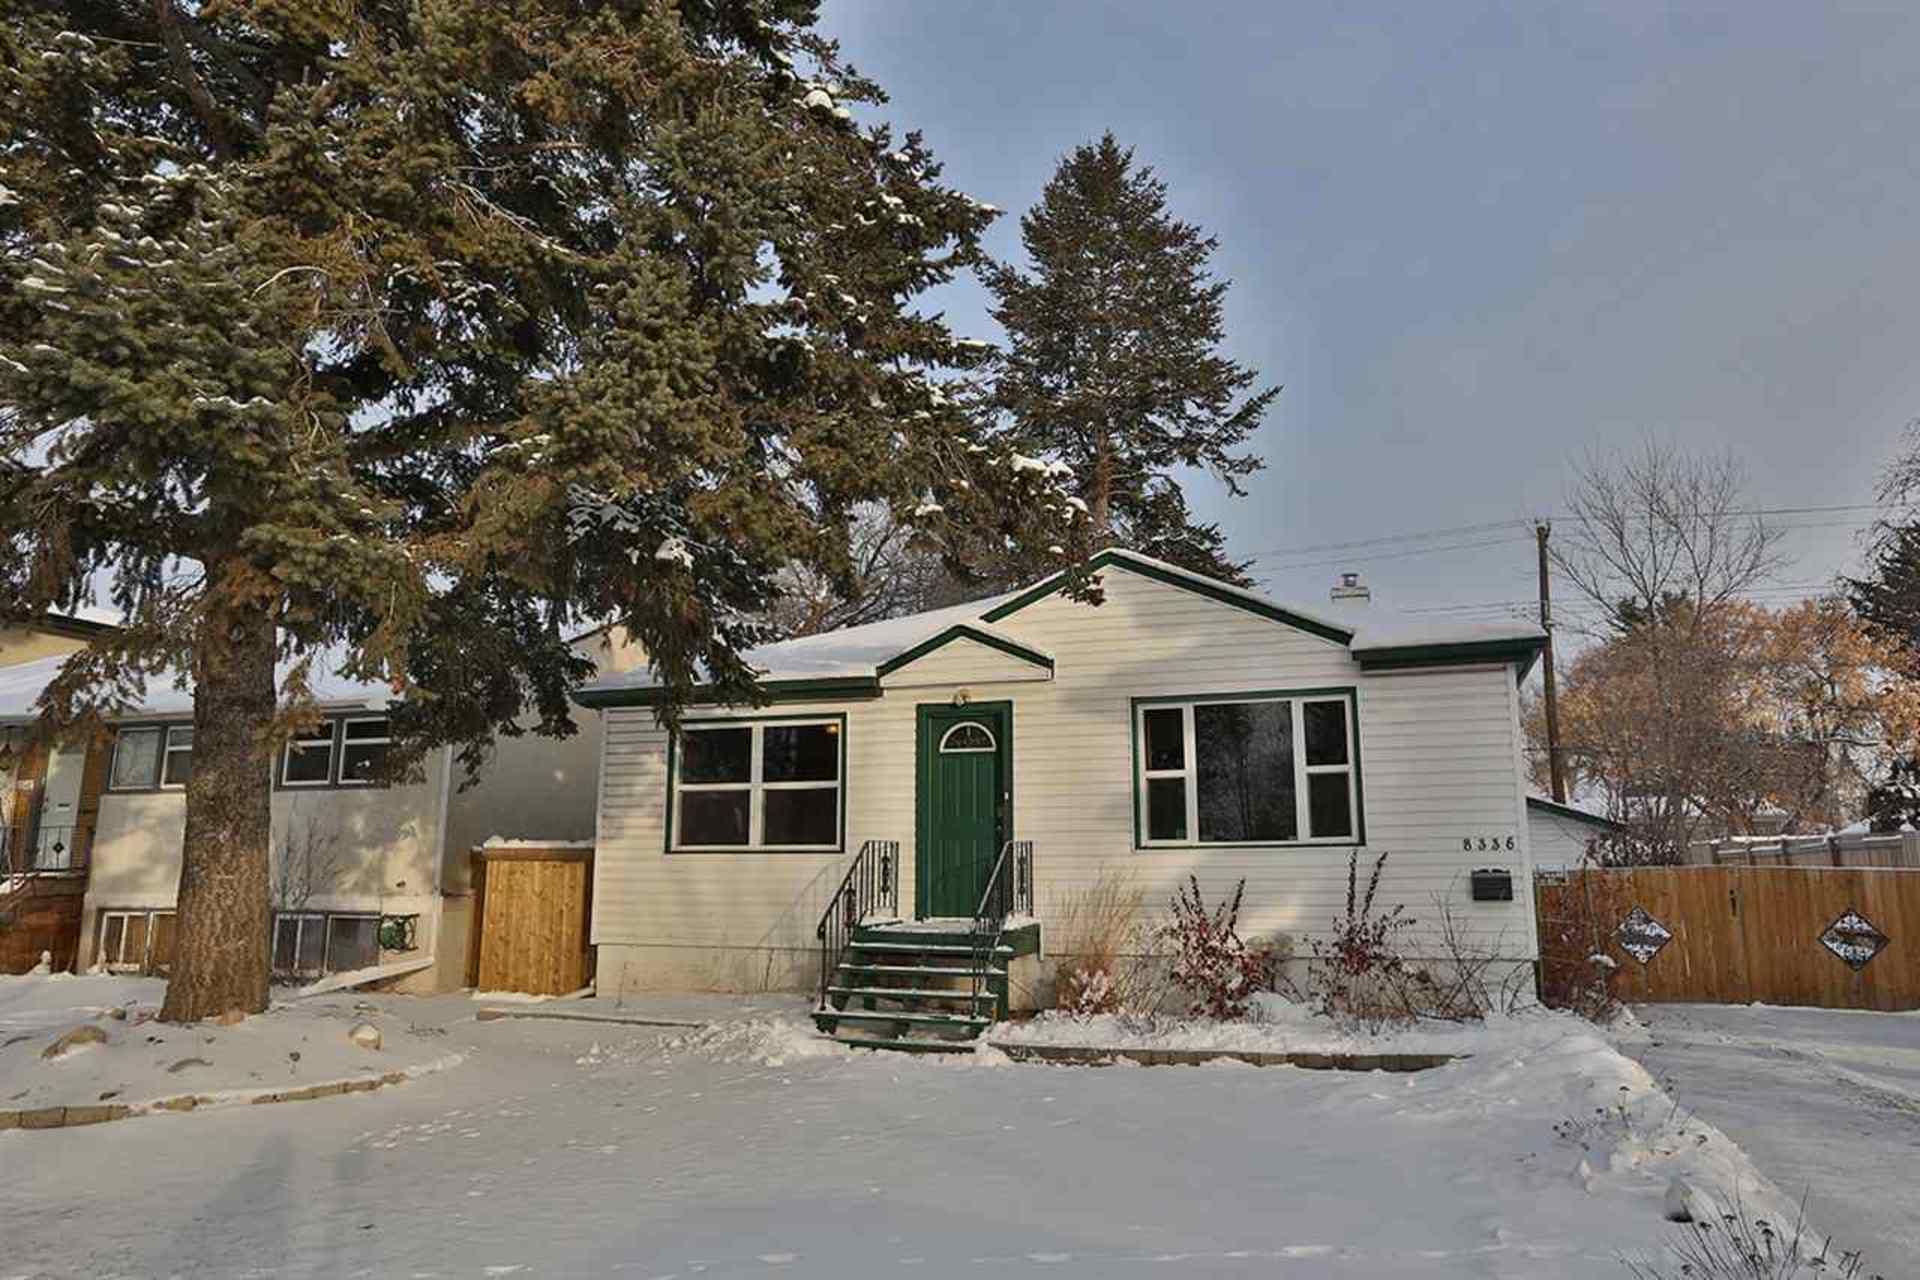 8336-76-avenue-king-edward-park-edmonton-01 at 8336 76 Avenue, King Edward Park, Edmonton